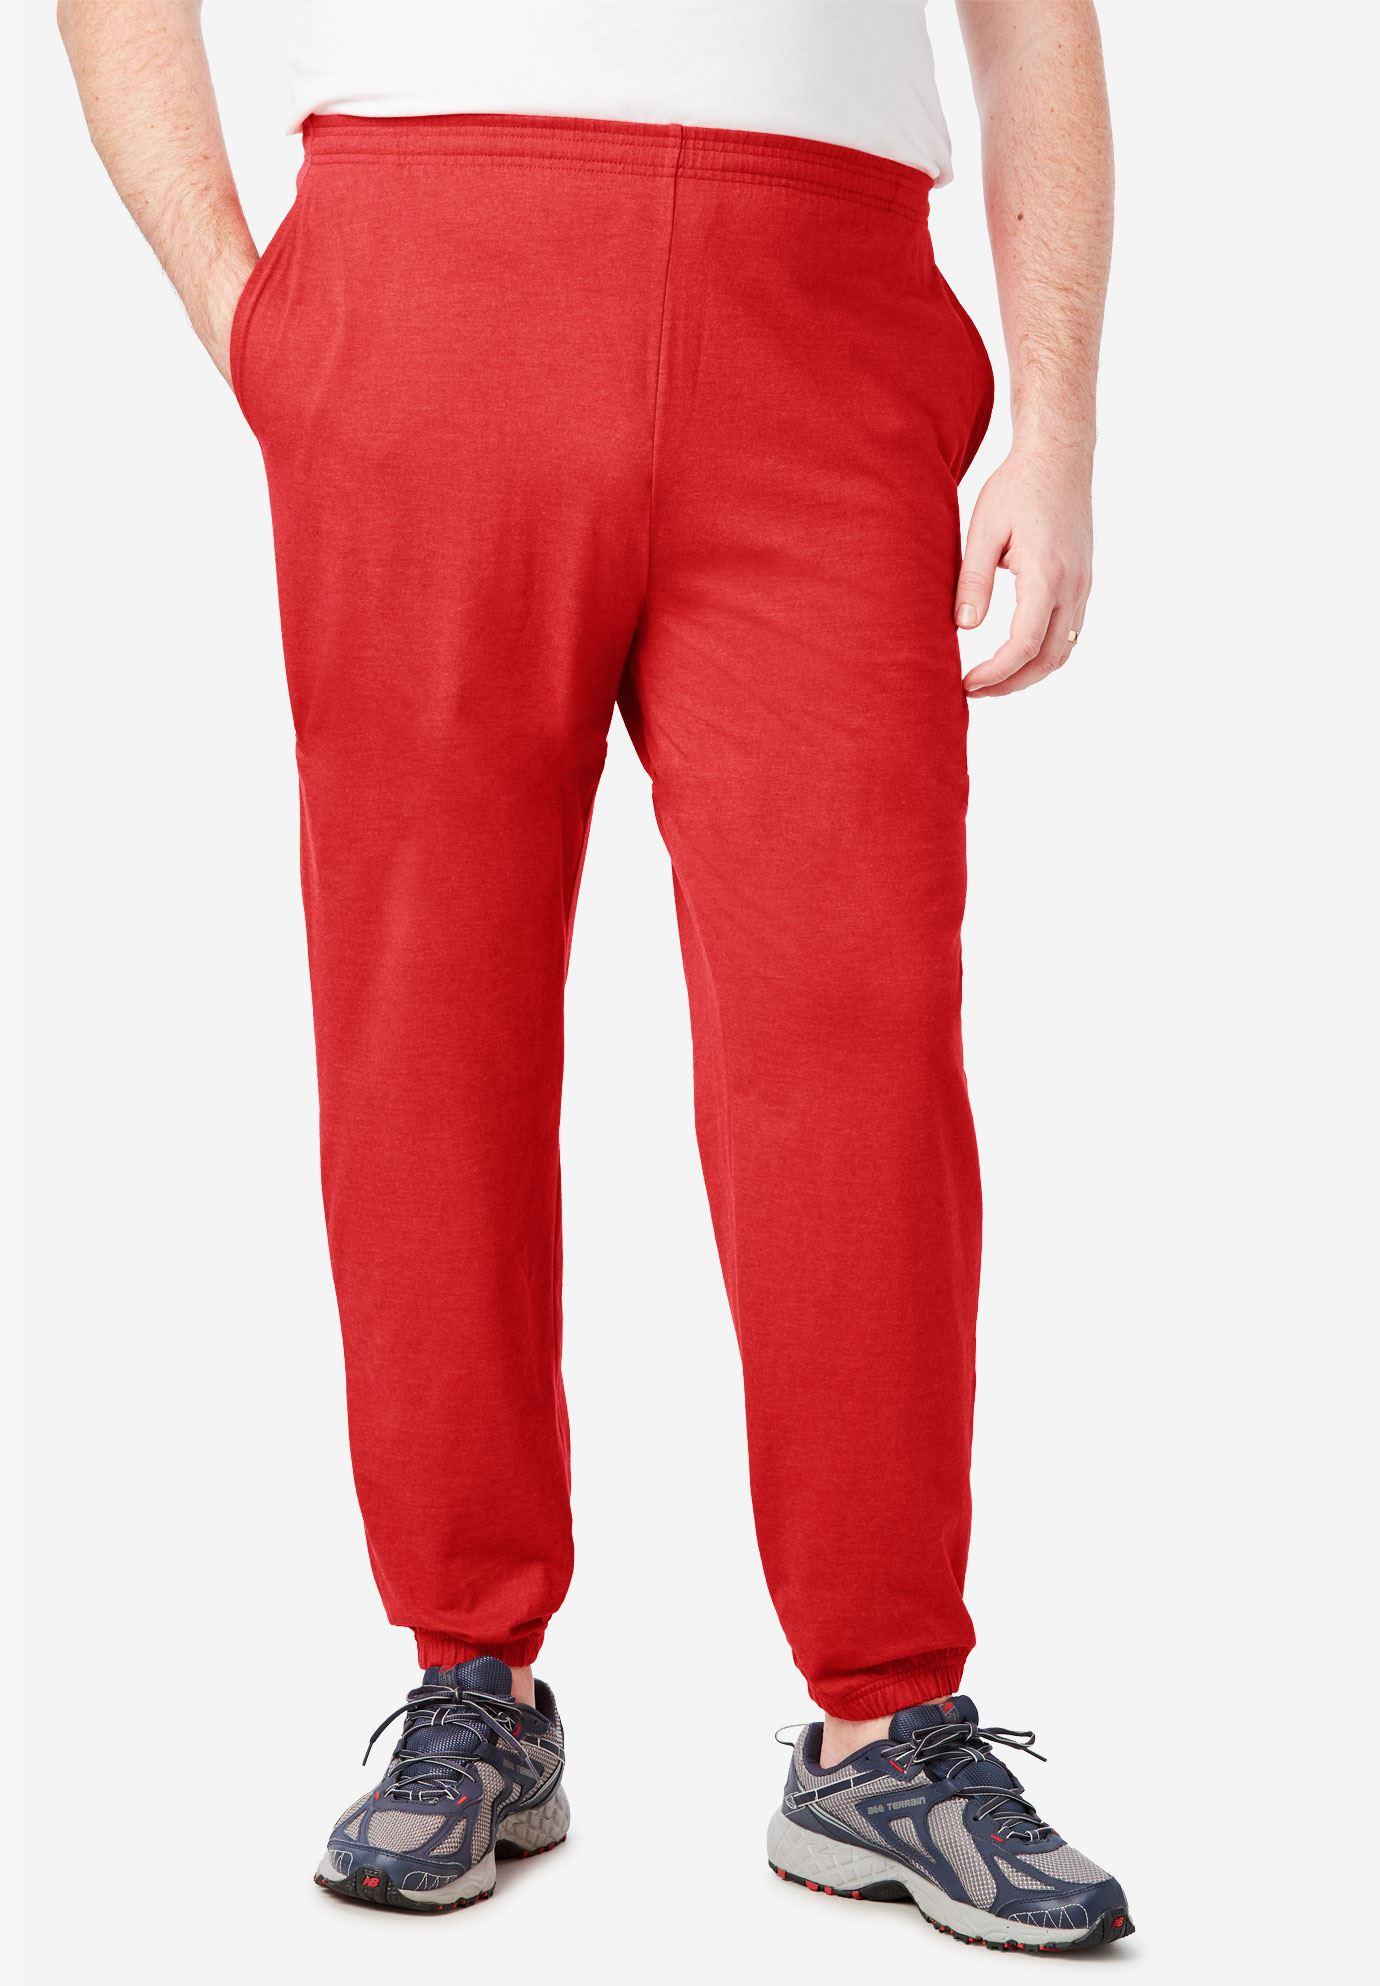 Kingsize Men's Big & Tall Lightweight Elastic Cuff Sweatpants